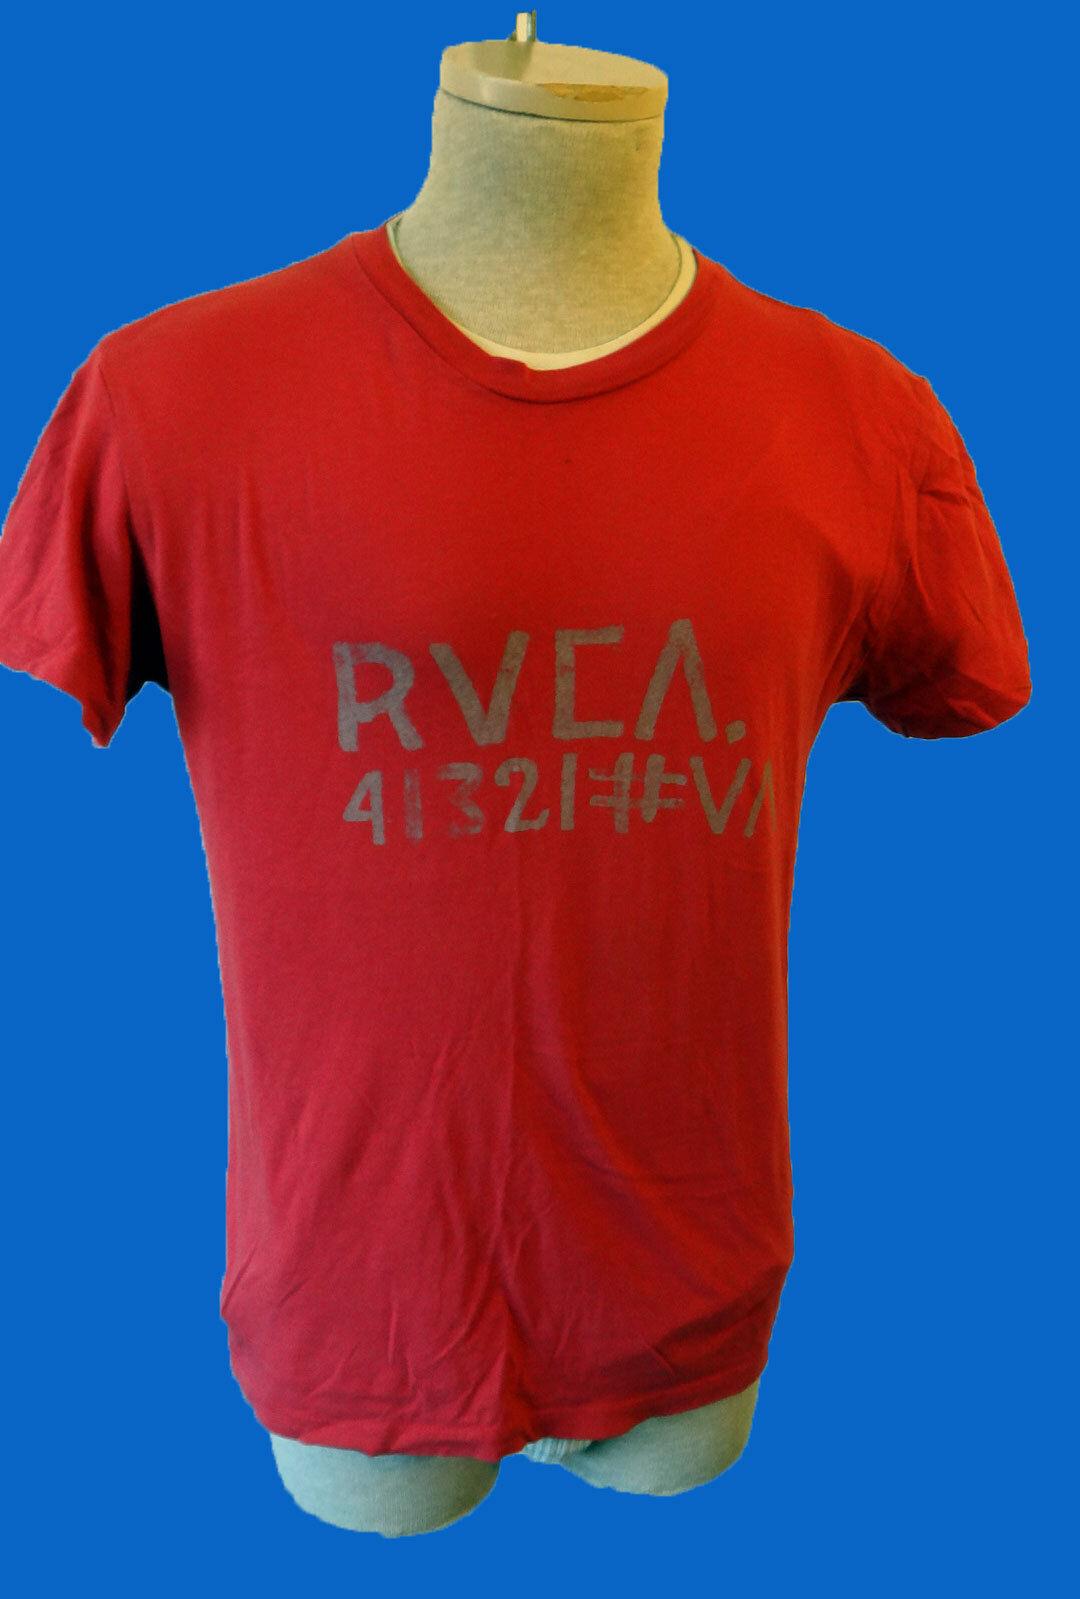 RVCA ANP Small Artist Network Program RED thin 41321 VA grey writing va